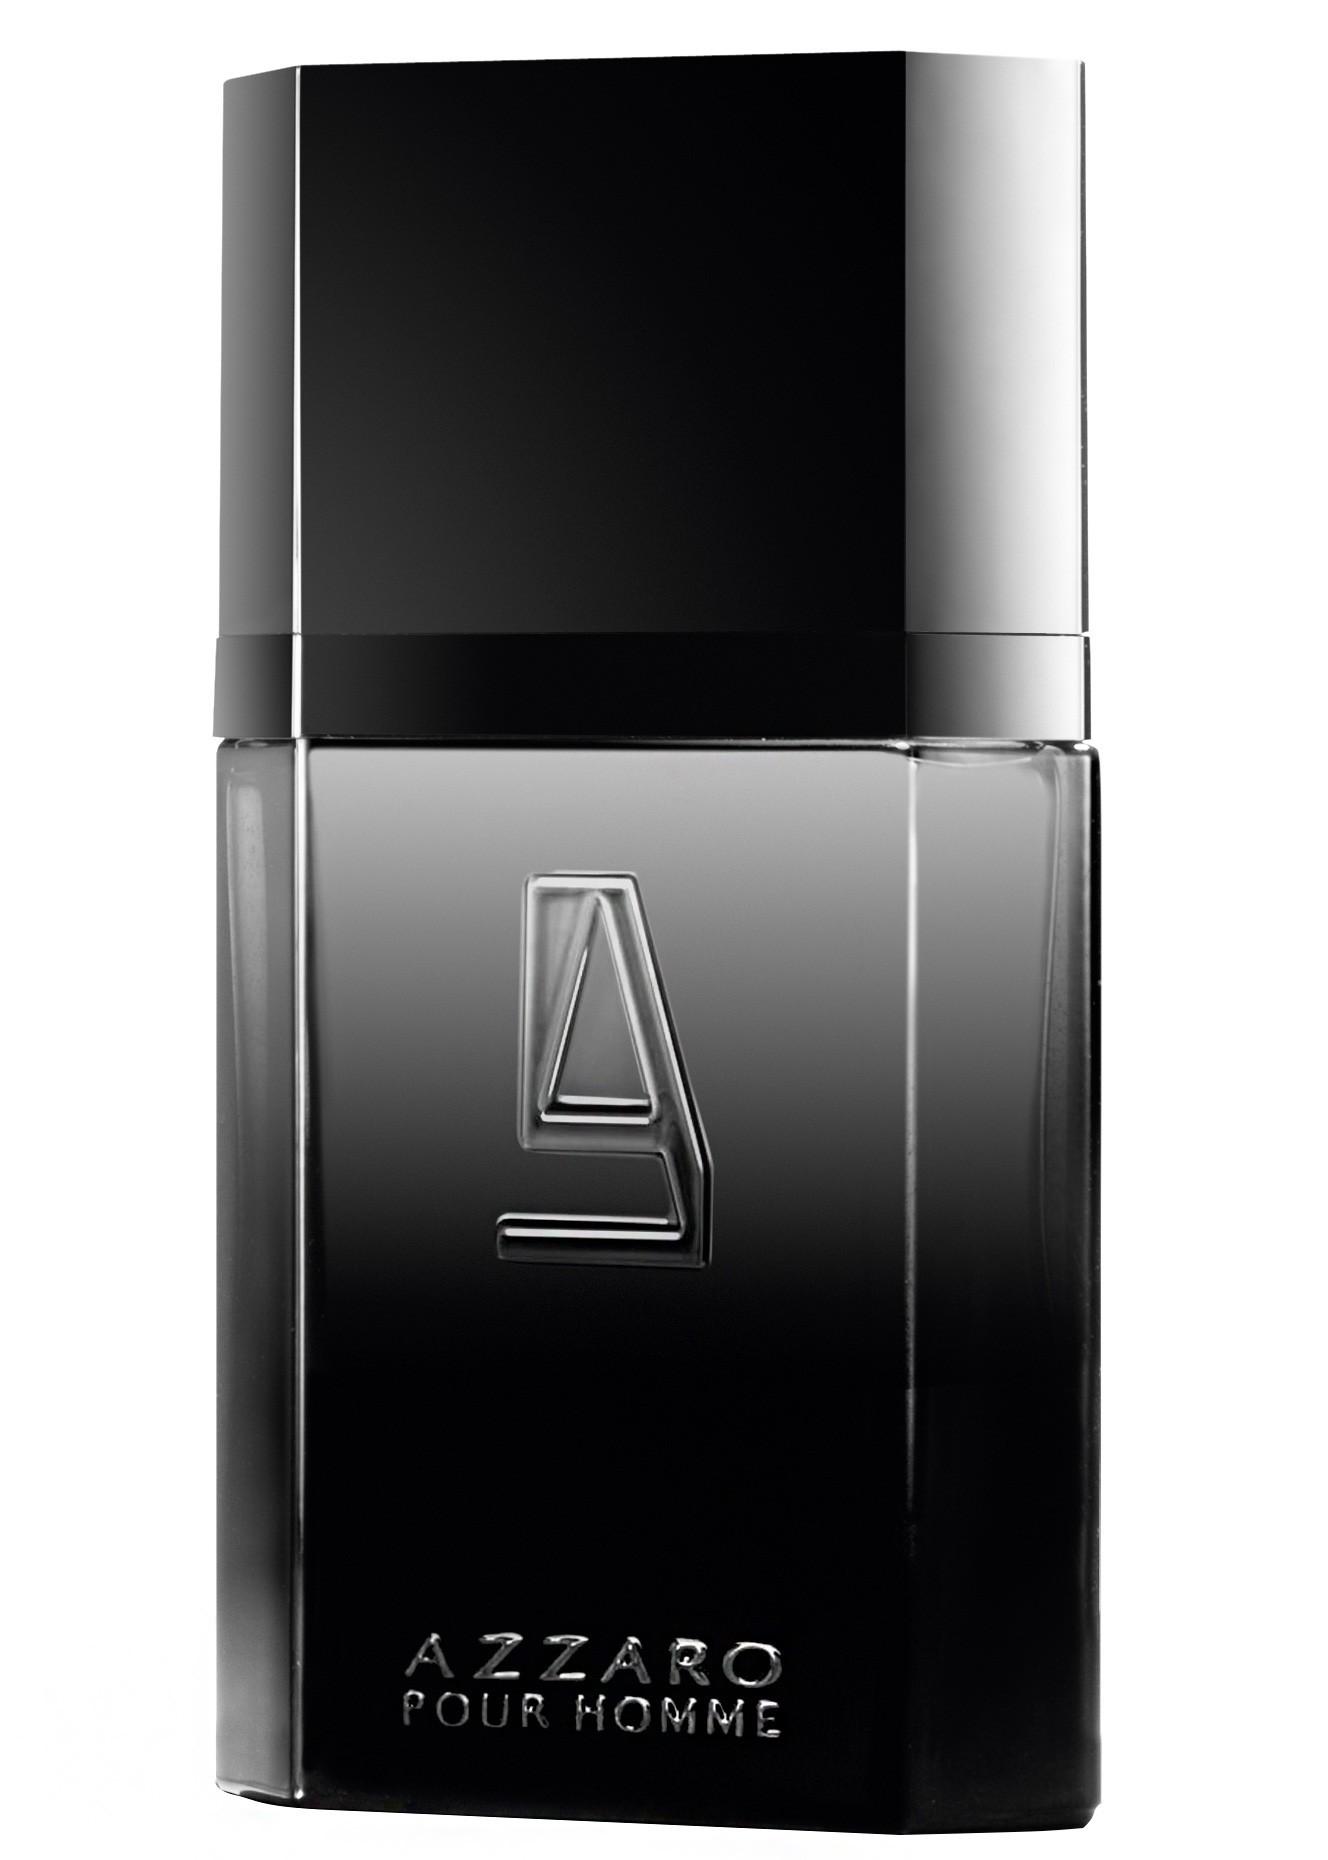 Azzaro Pour Homme Night Time аромат для мужчин